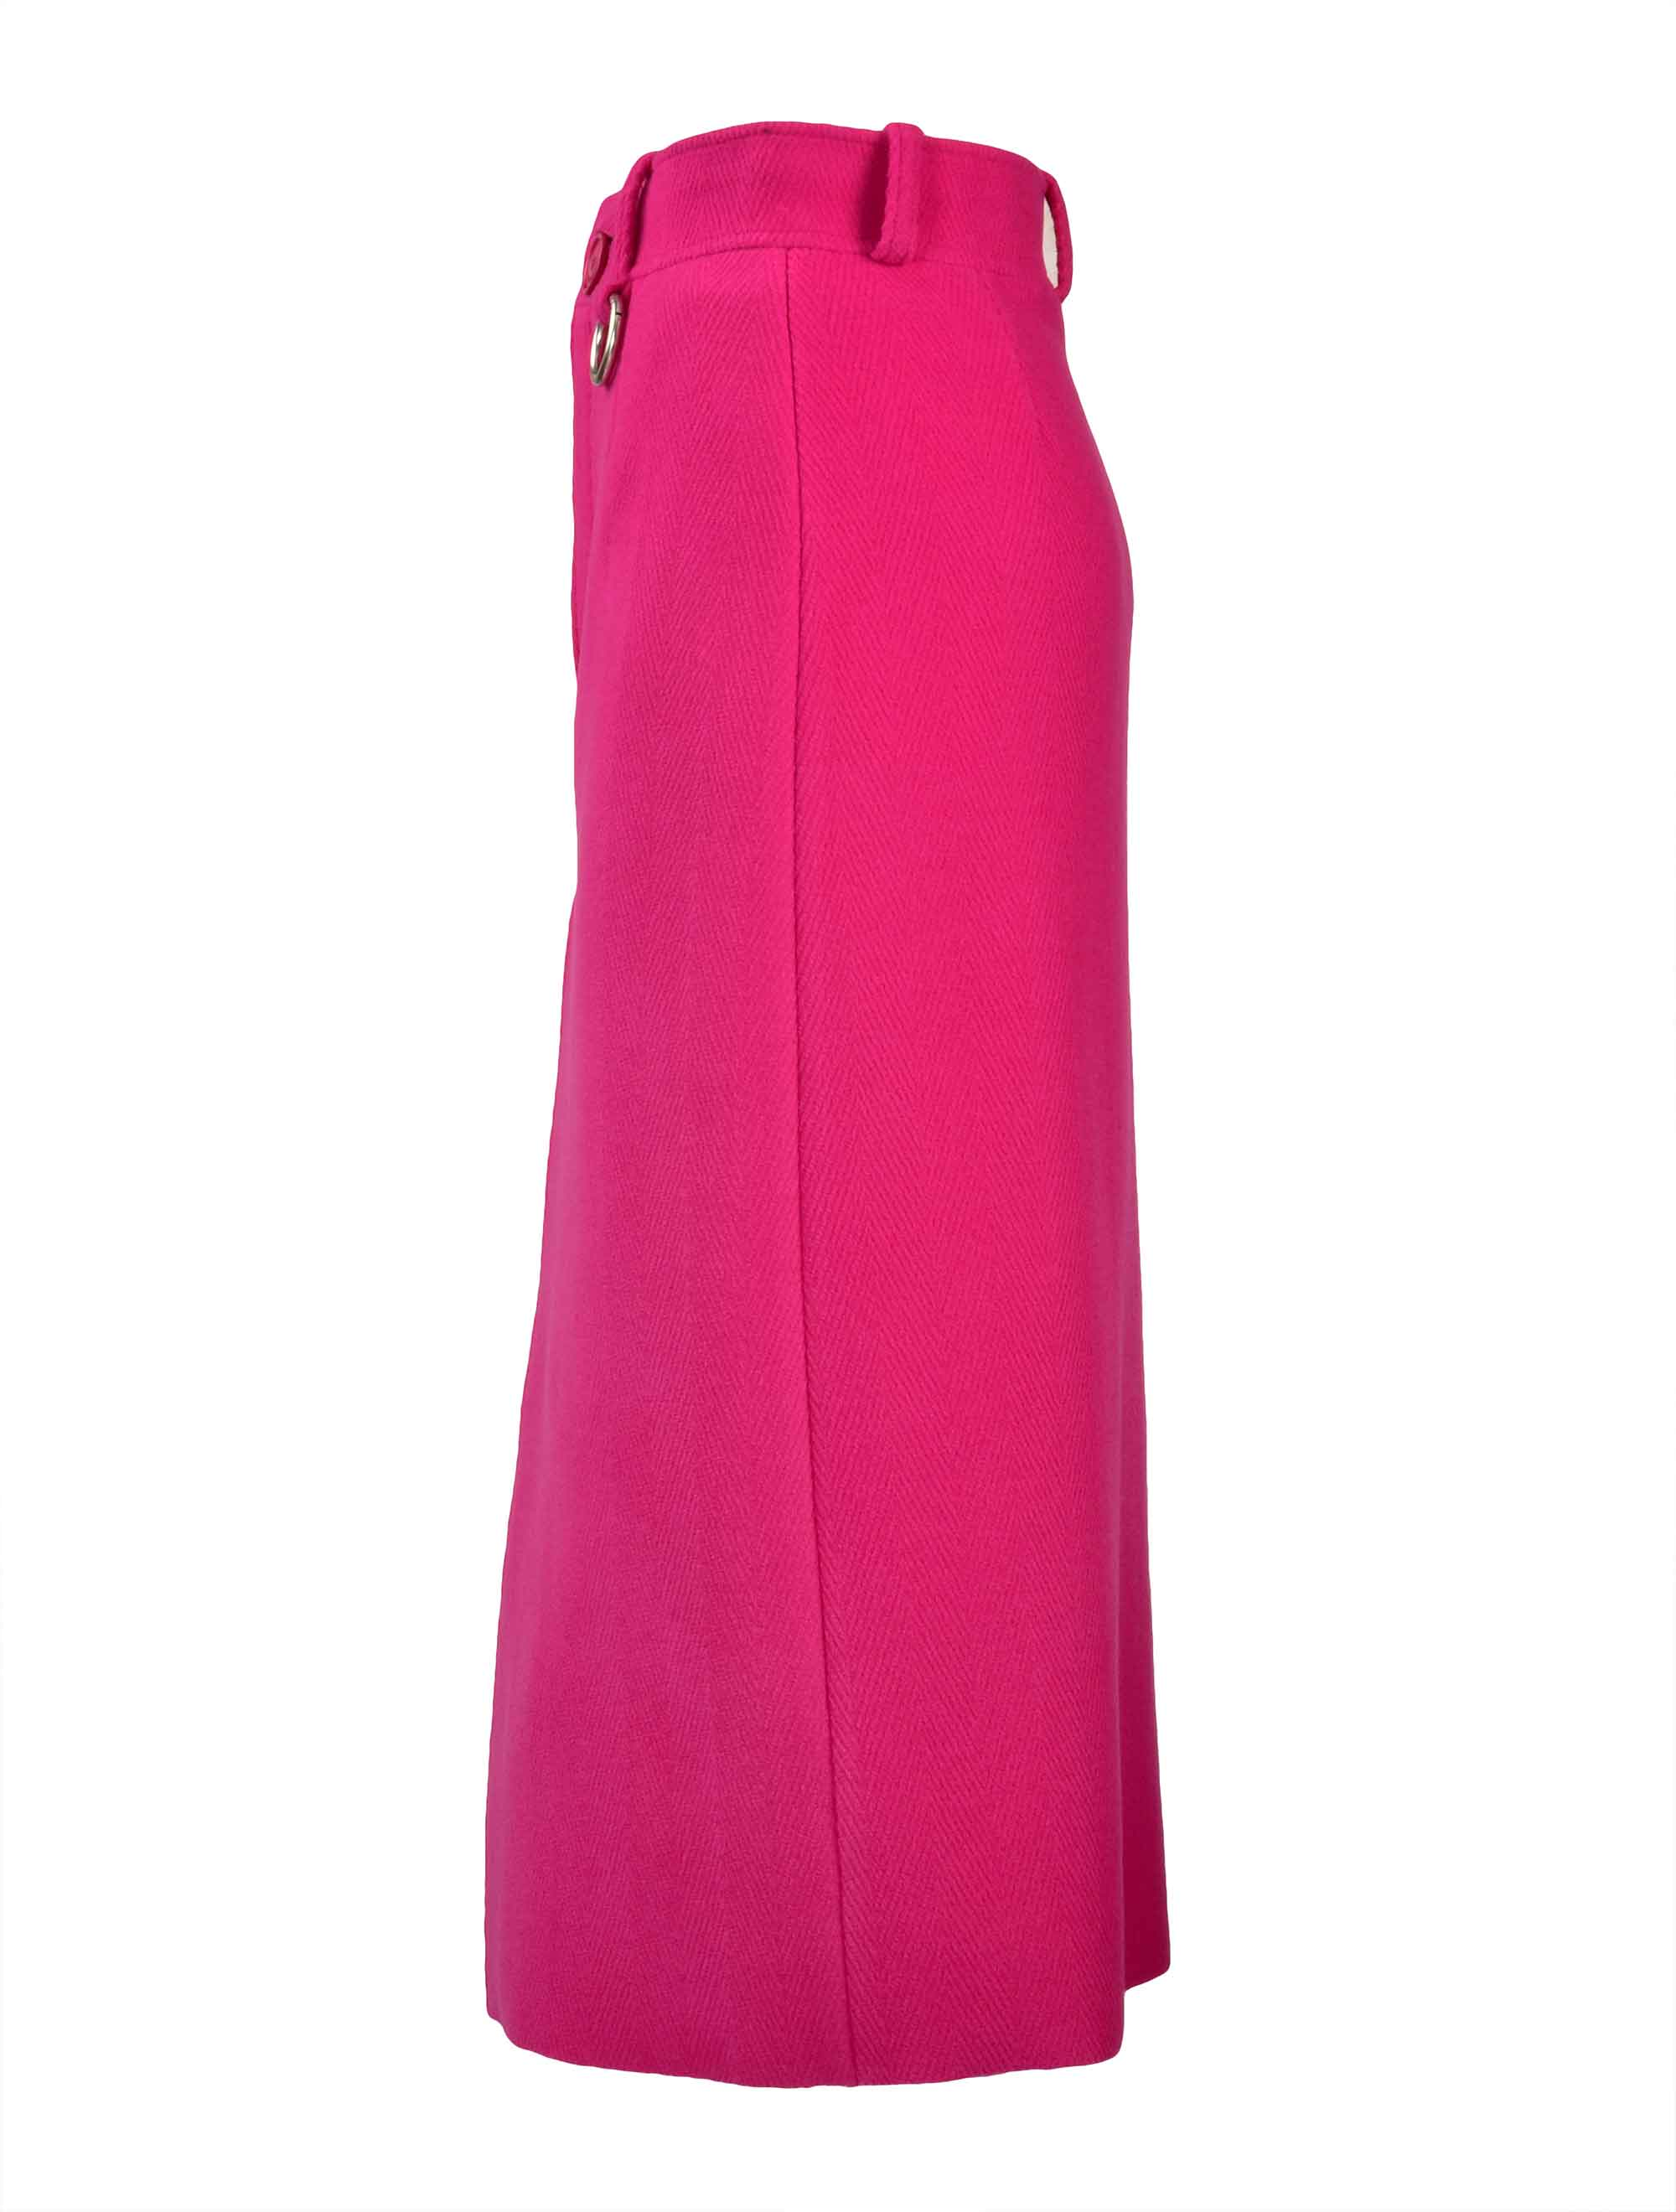 Picture of Balenciaga | Pleat Skirt In Herringbone Wool